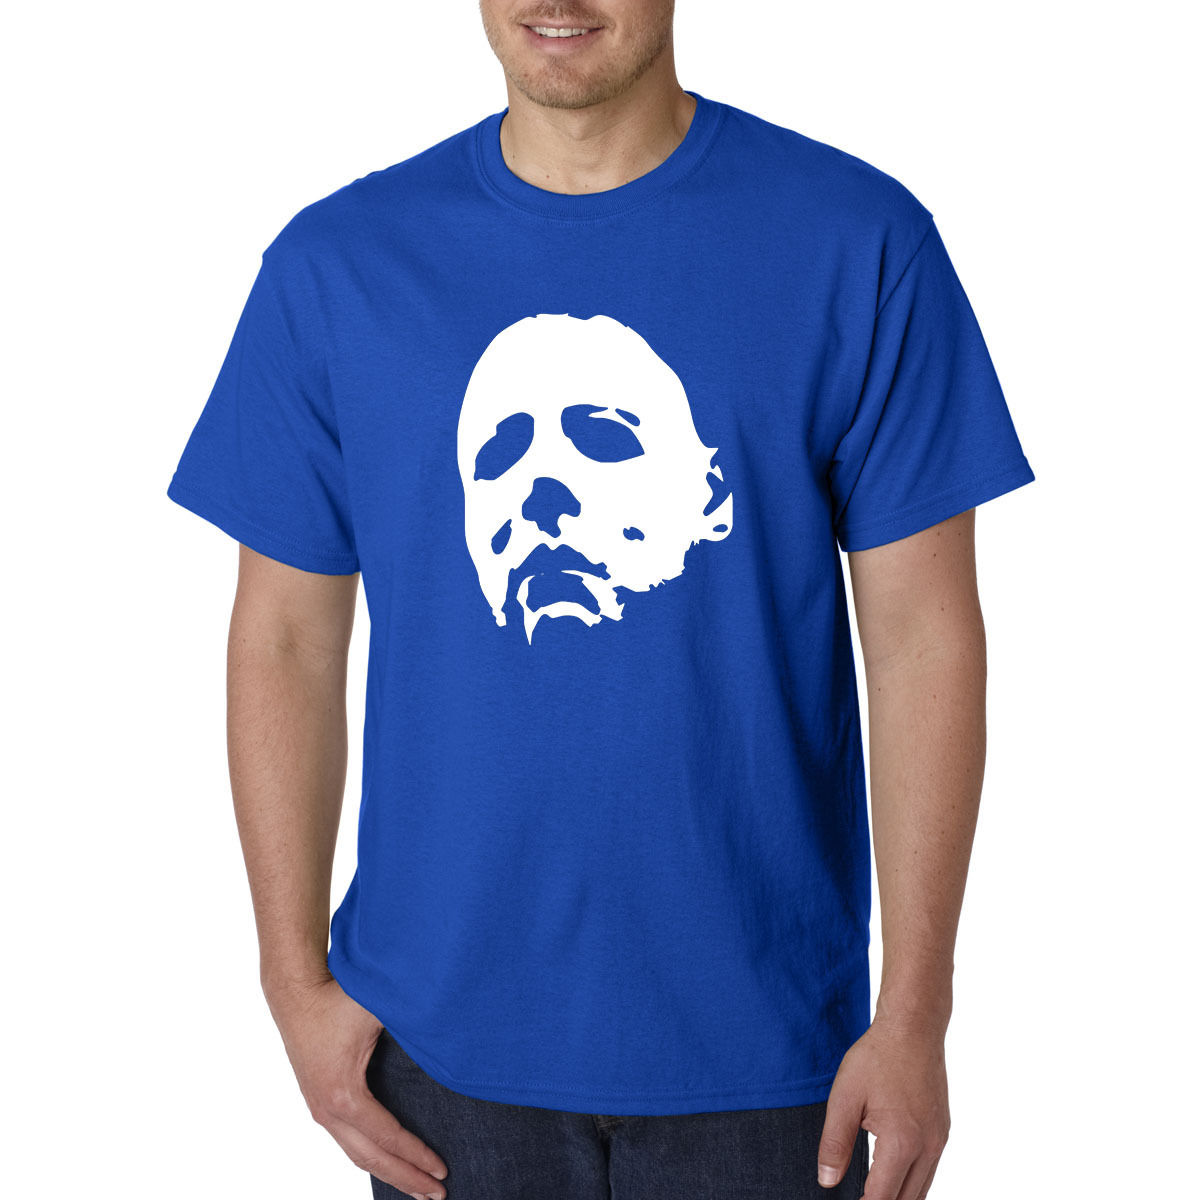 2018 Hot Sale 100% Cotton HALLOWEEN Mask T-Shirt - Michael Myers Horror 1978 Jason Freddy Movie Horror Tee Shirt